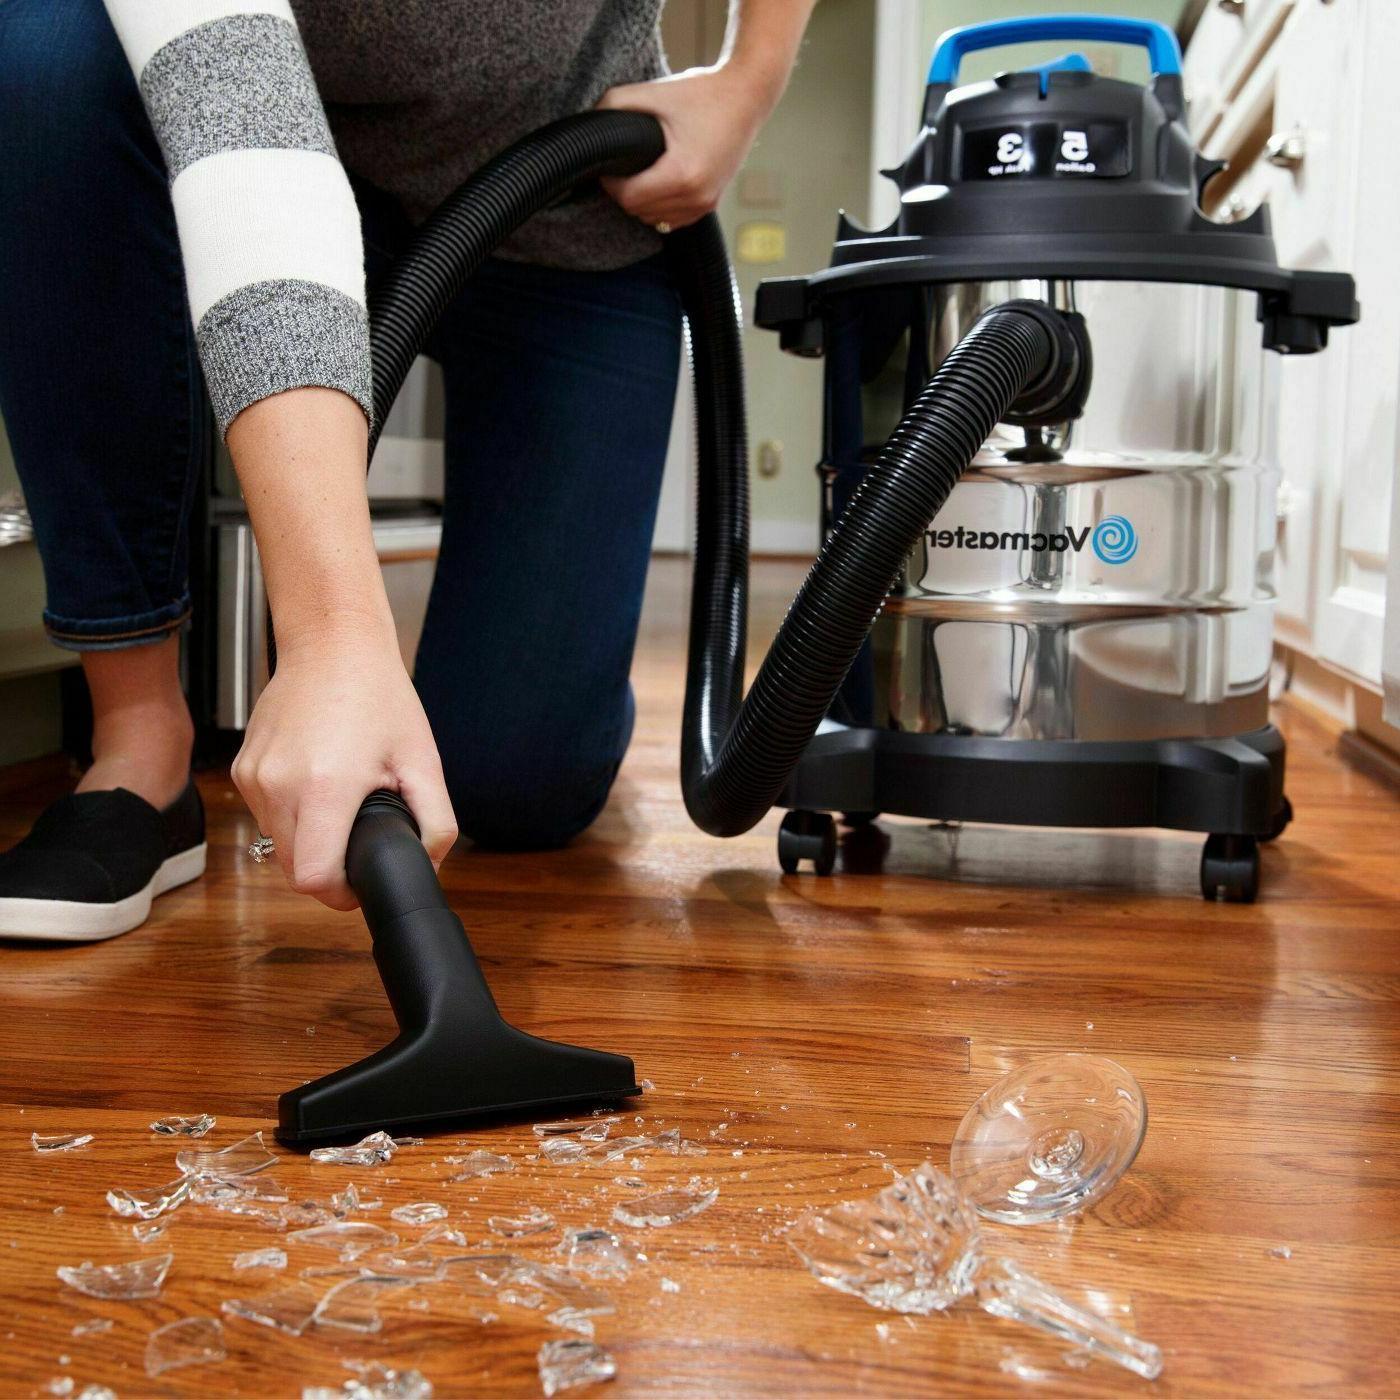 Stainless Vac 5 Vacuum Cleaner 3 Blower New